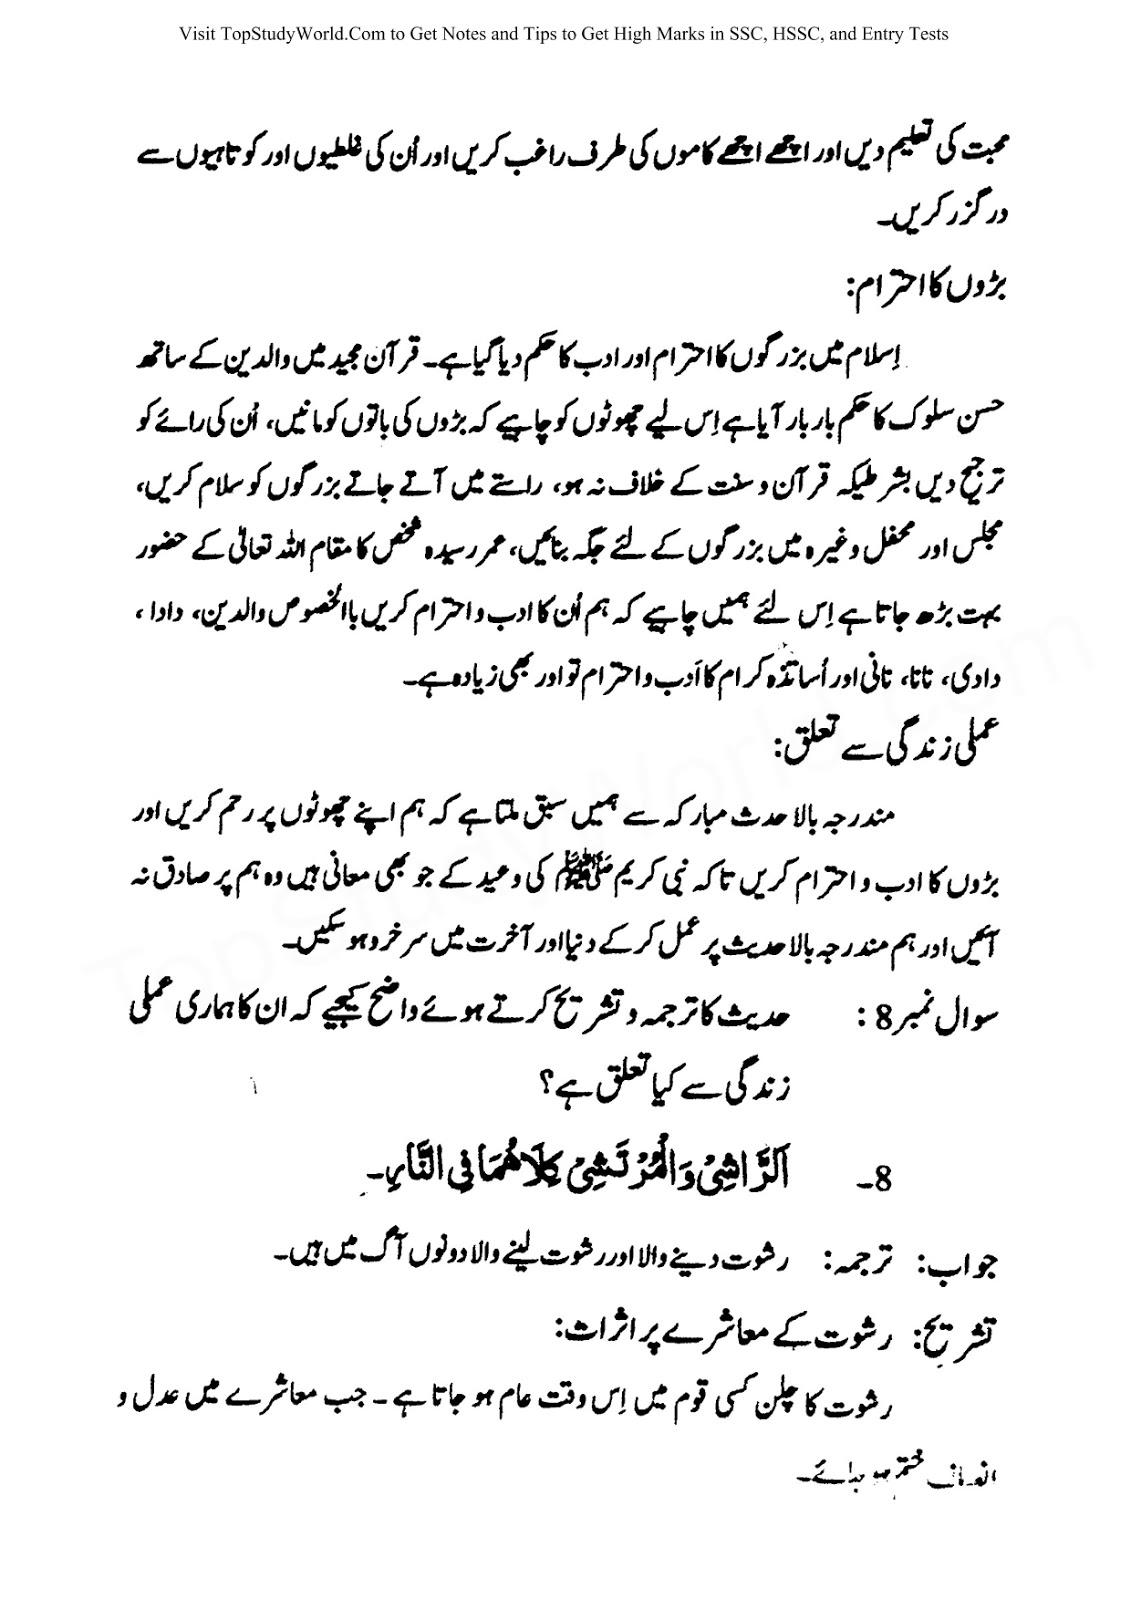 Ahadees 1-10 9th Class Islamiyat Notes (Urdu) | Top Study World